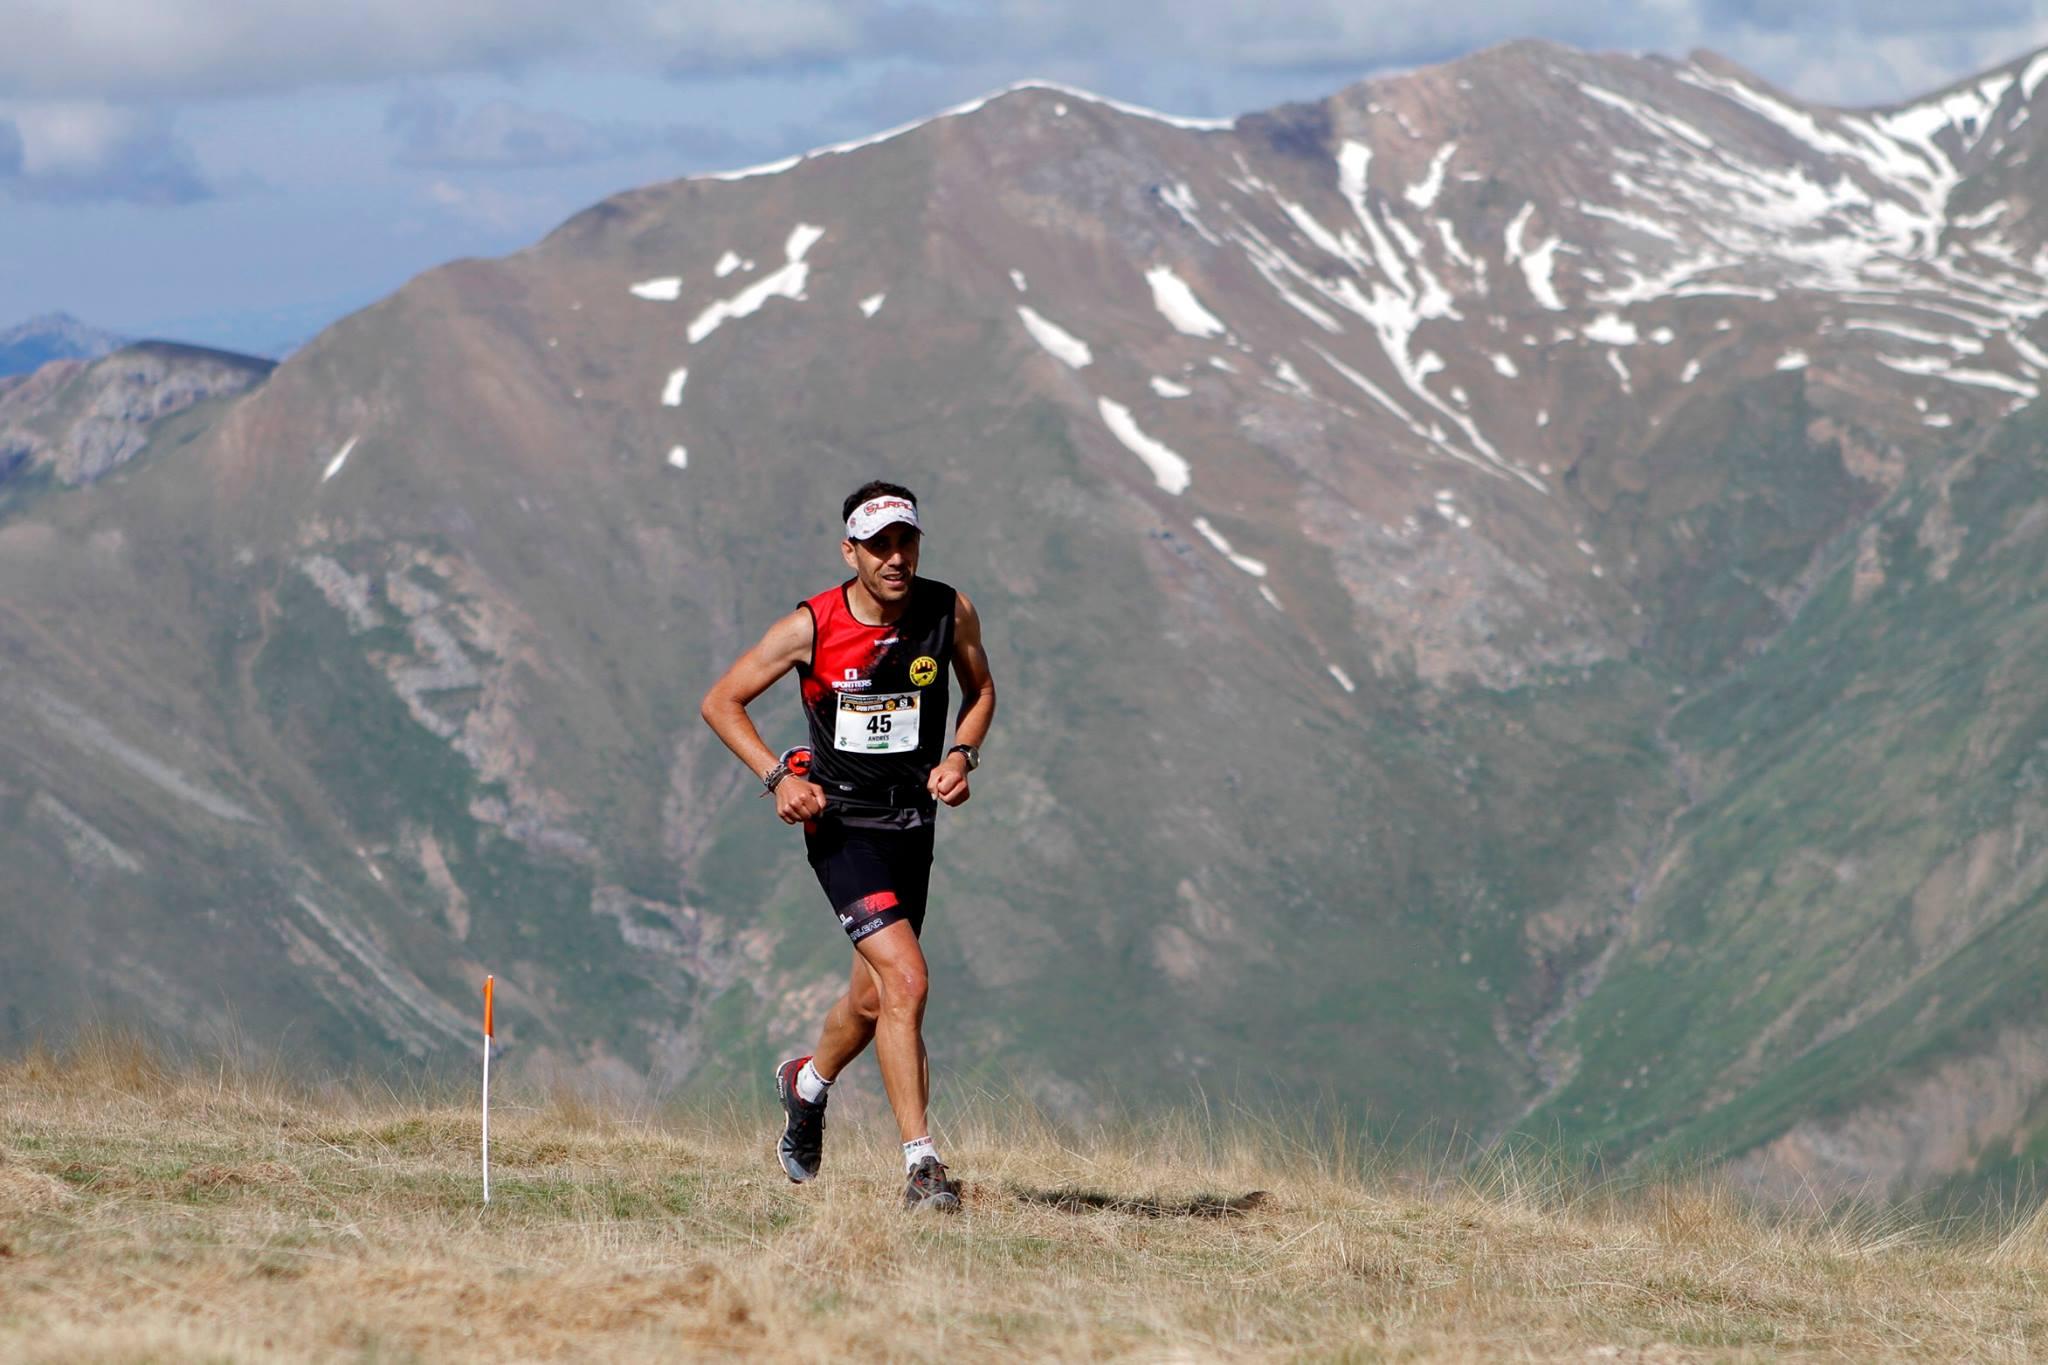 La Vilaller Vertical Race acull l'Skyrunning National Championship Vertical